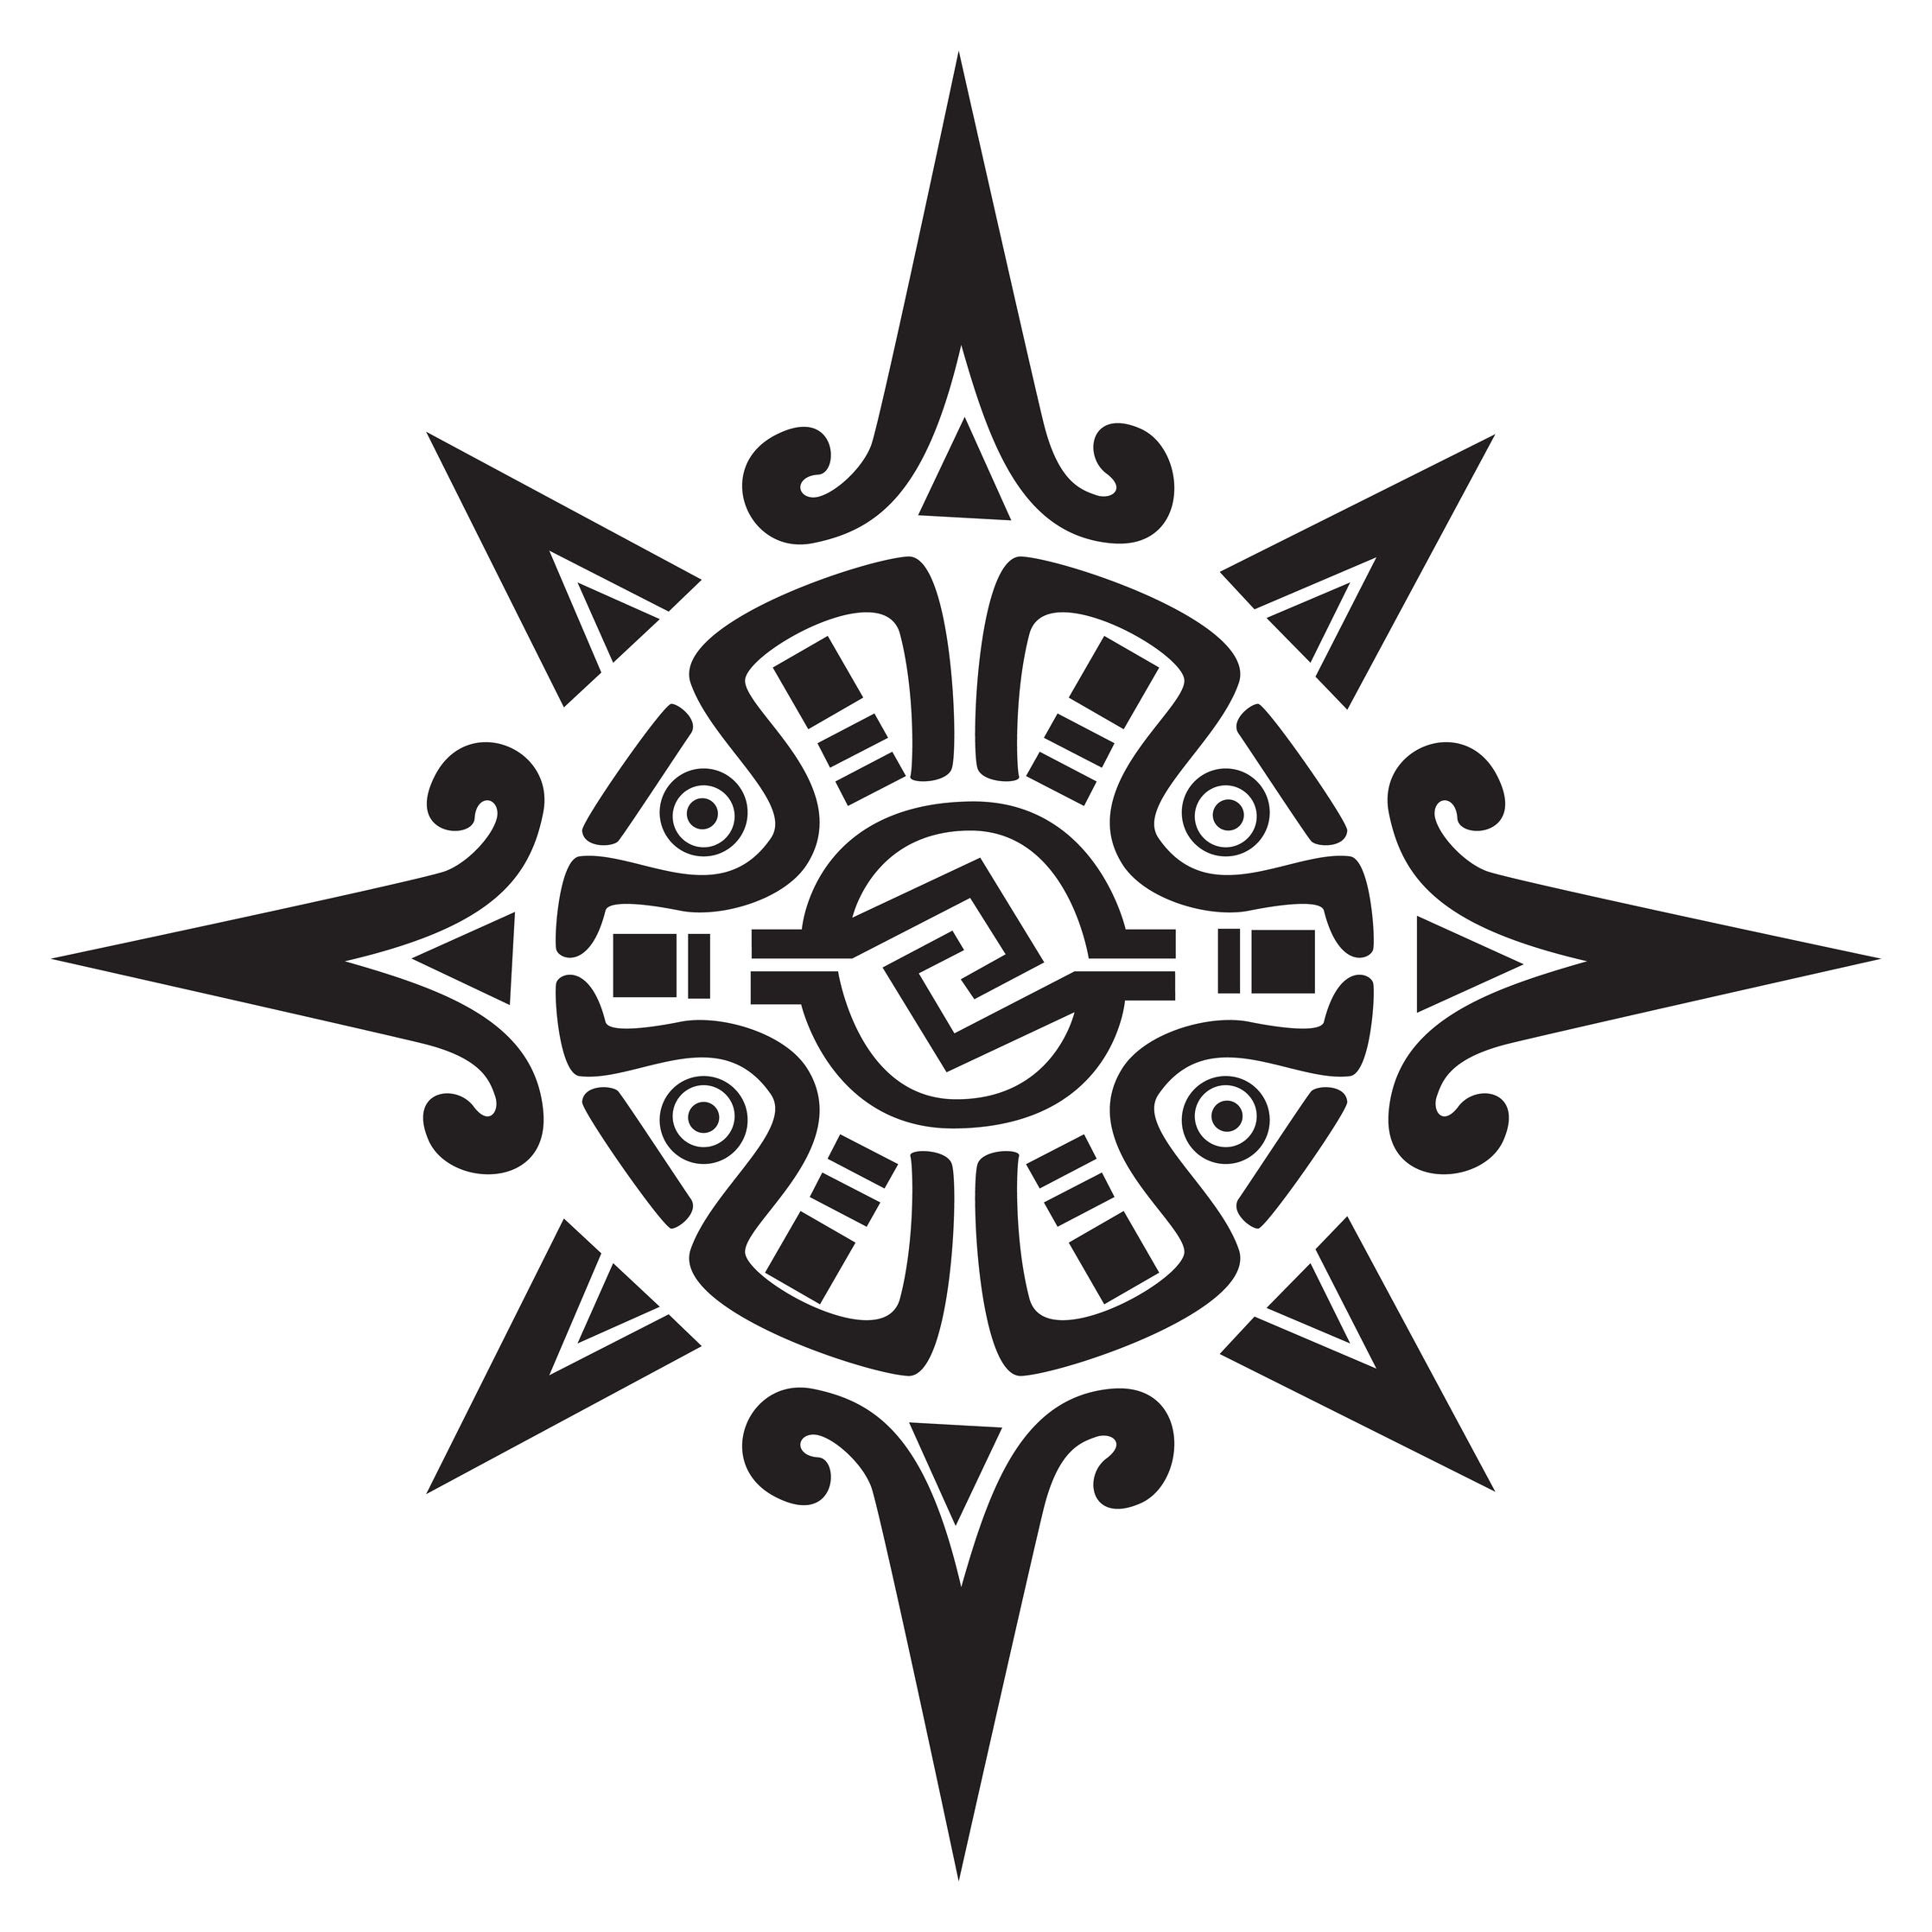 Simbolos Maories Para Tatuajes Tatuajes Maories En La Auto